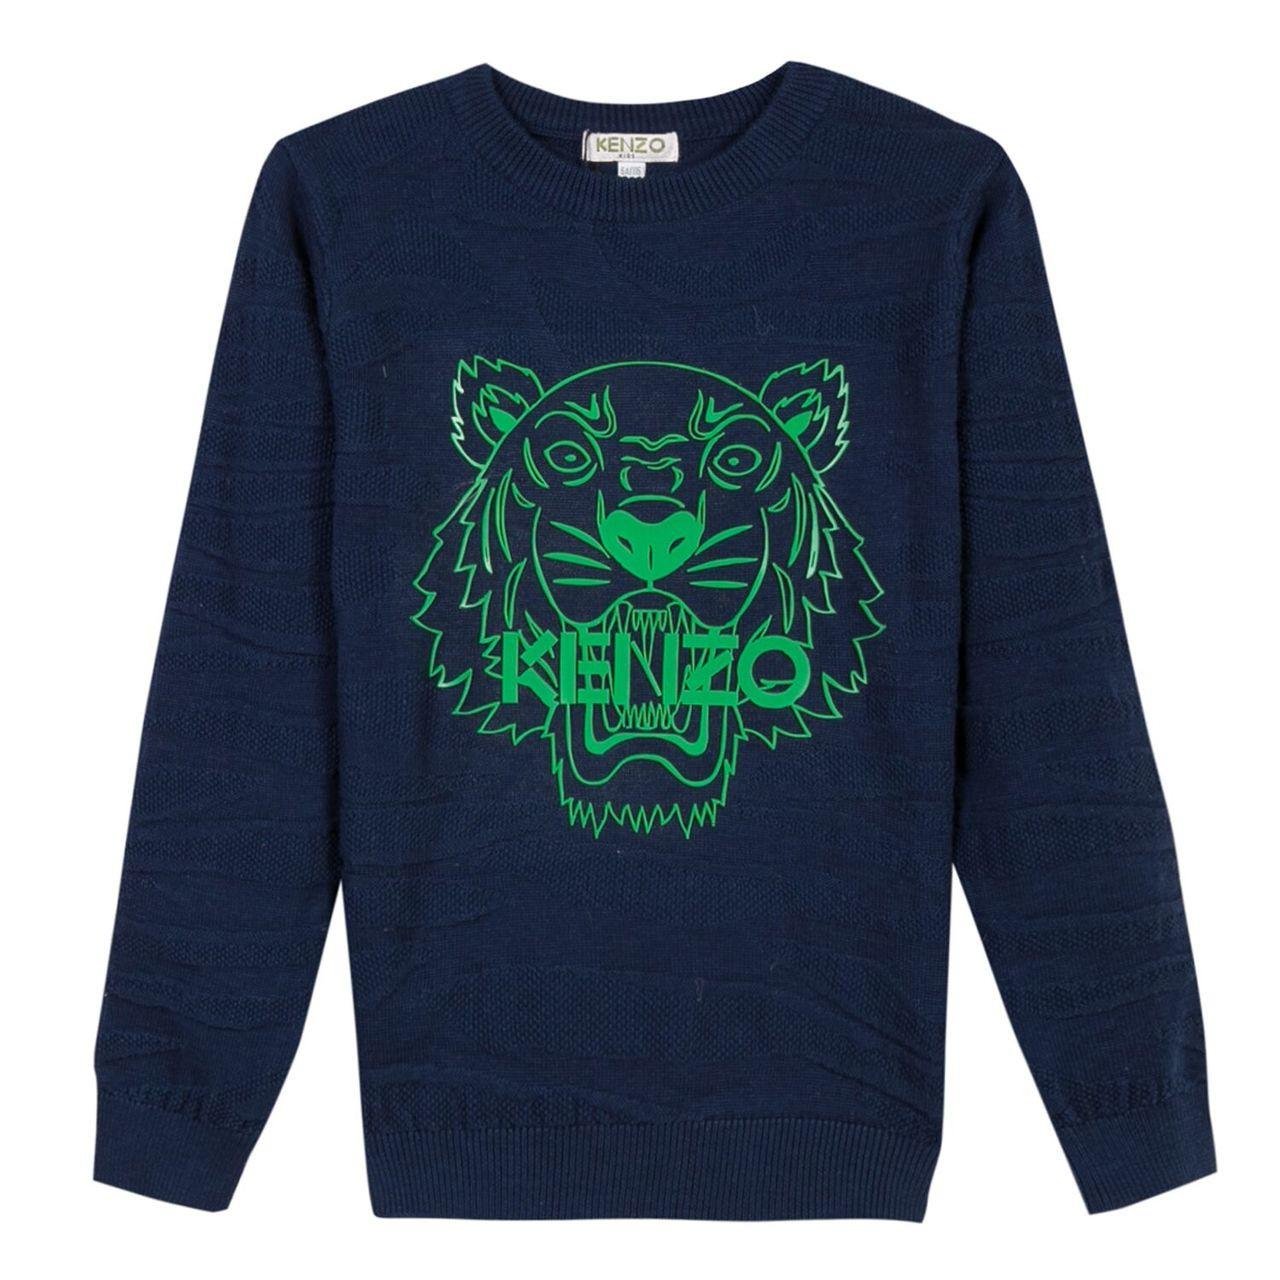 6aaee8c828 Negozio di sconti online,Kenzo Sweater